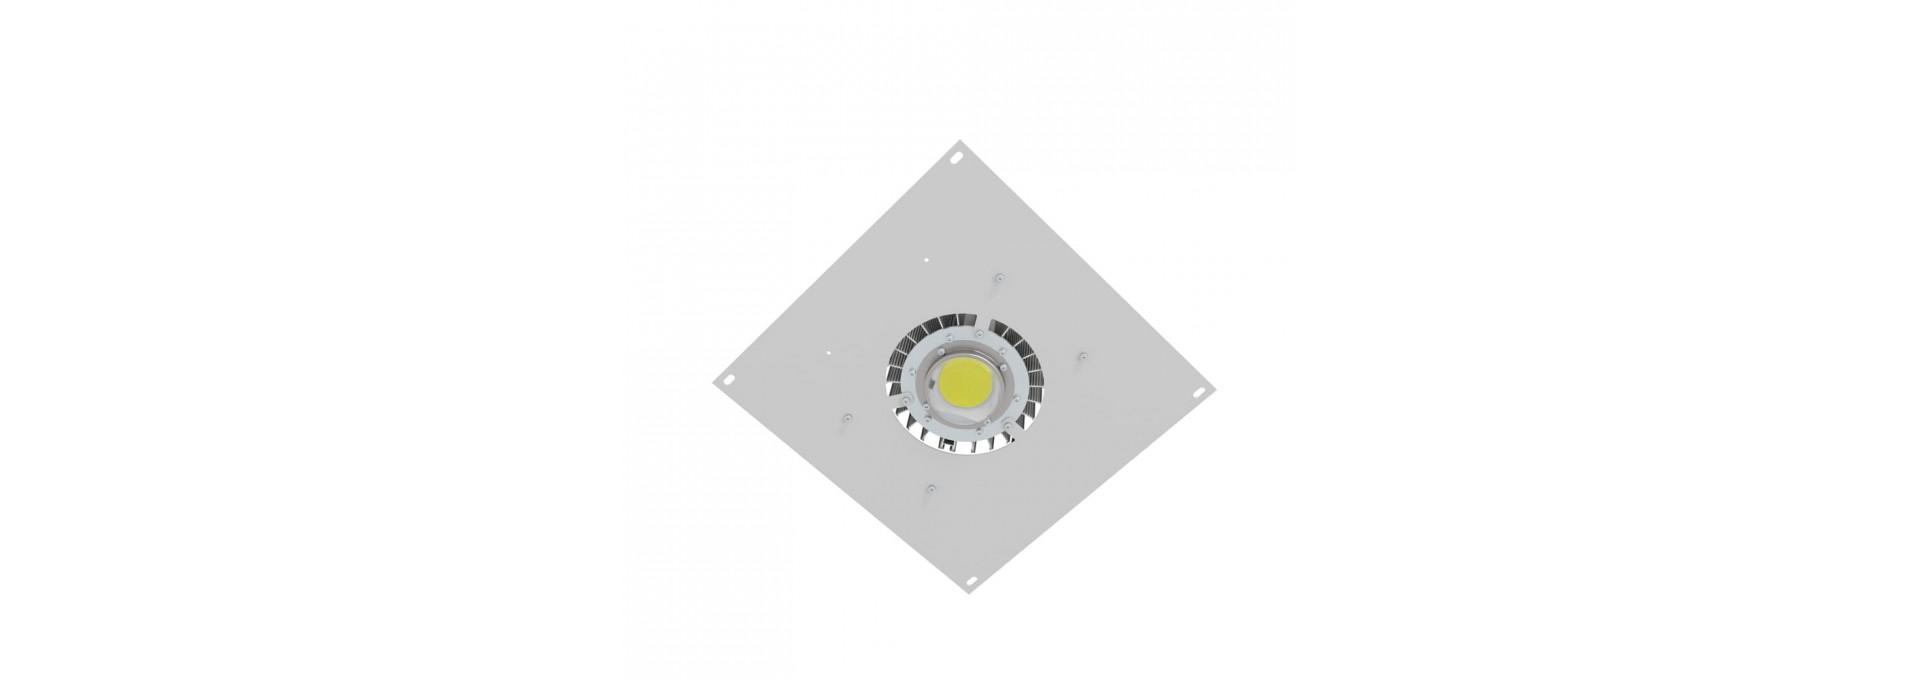 АЗС 100 Эко 6500К 90°